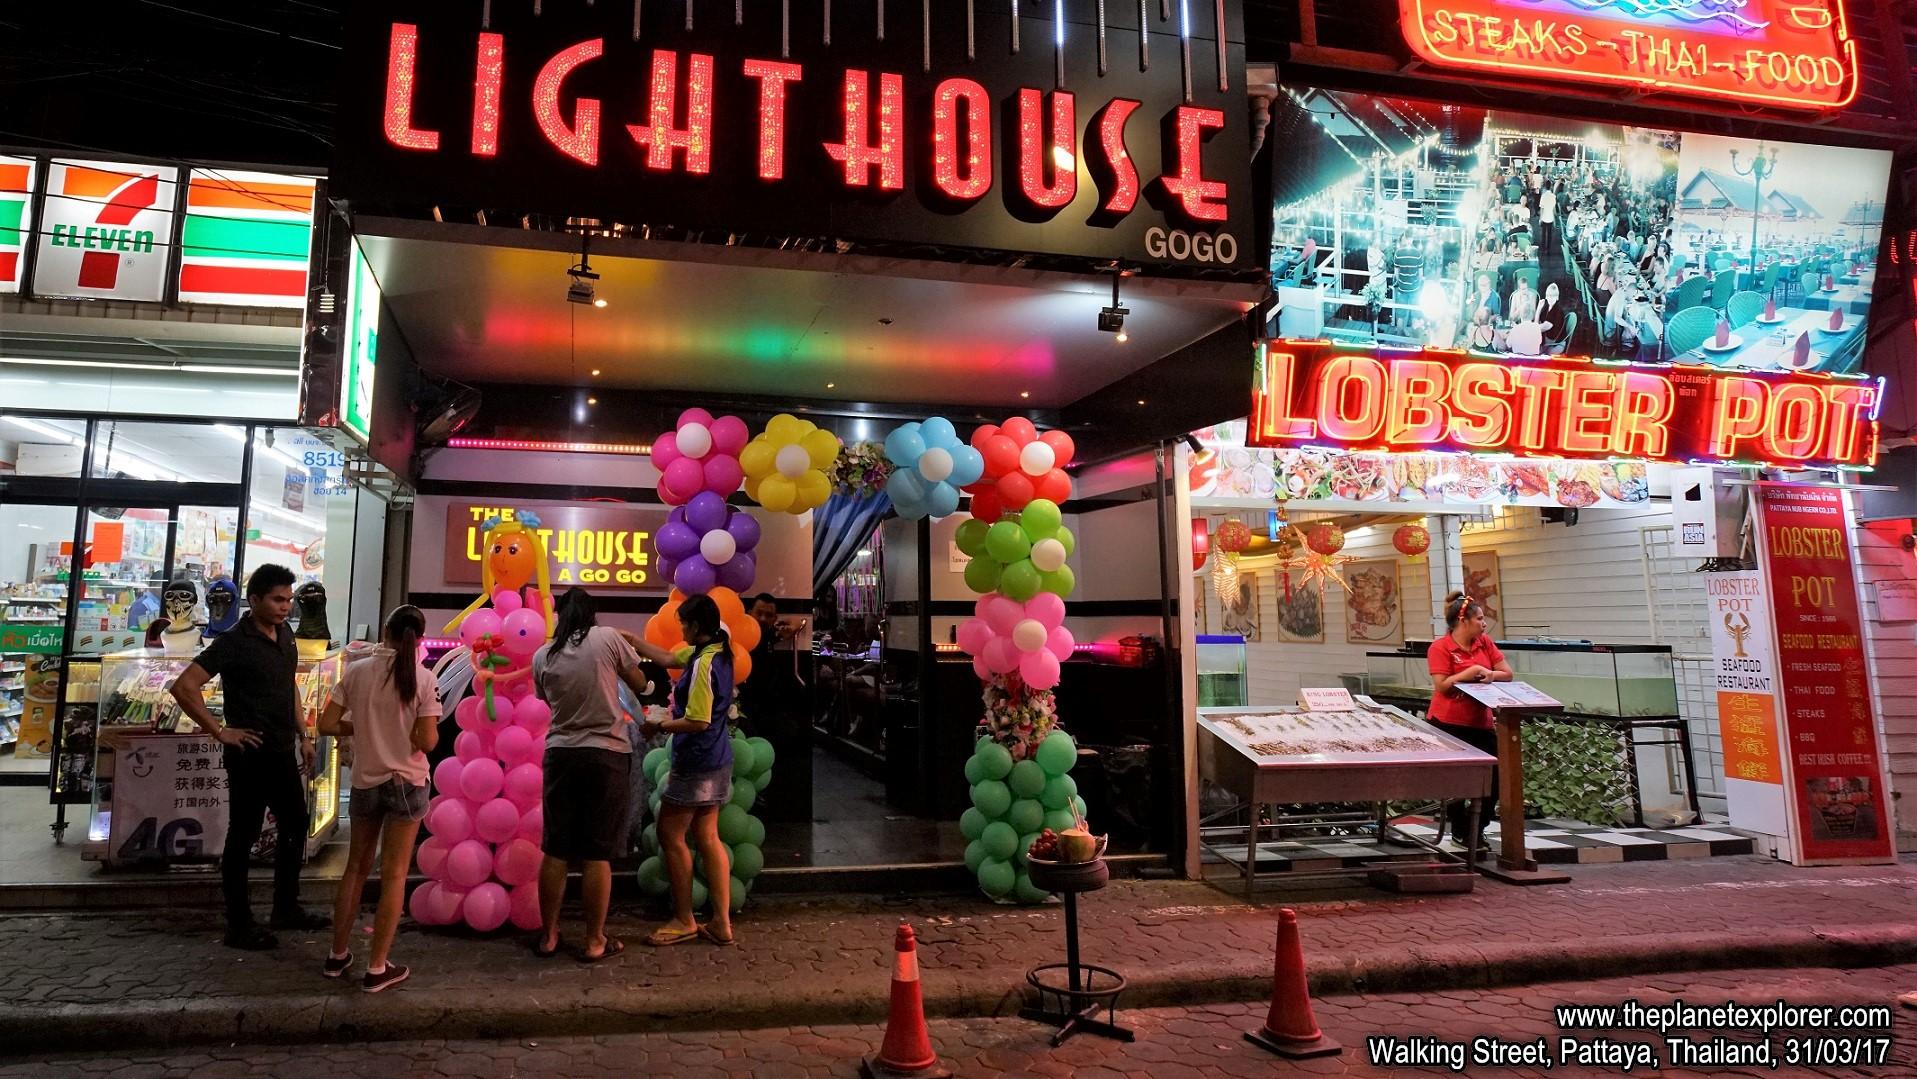 2017-03-31_1959_Thailand_Pattaya_Walking Street_Lighthouse_DSC04096_s7R2_LR_@